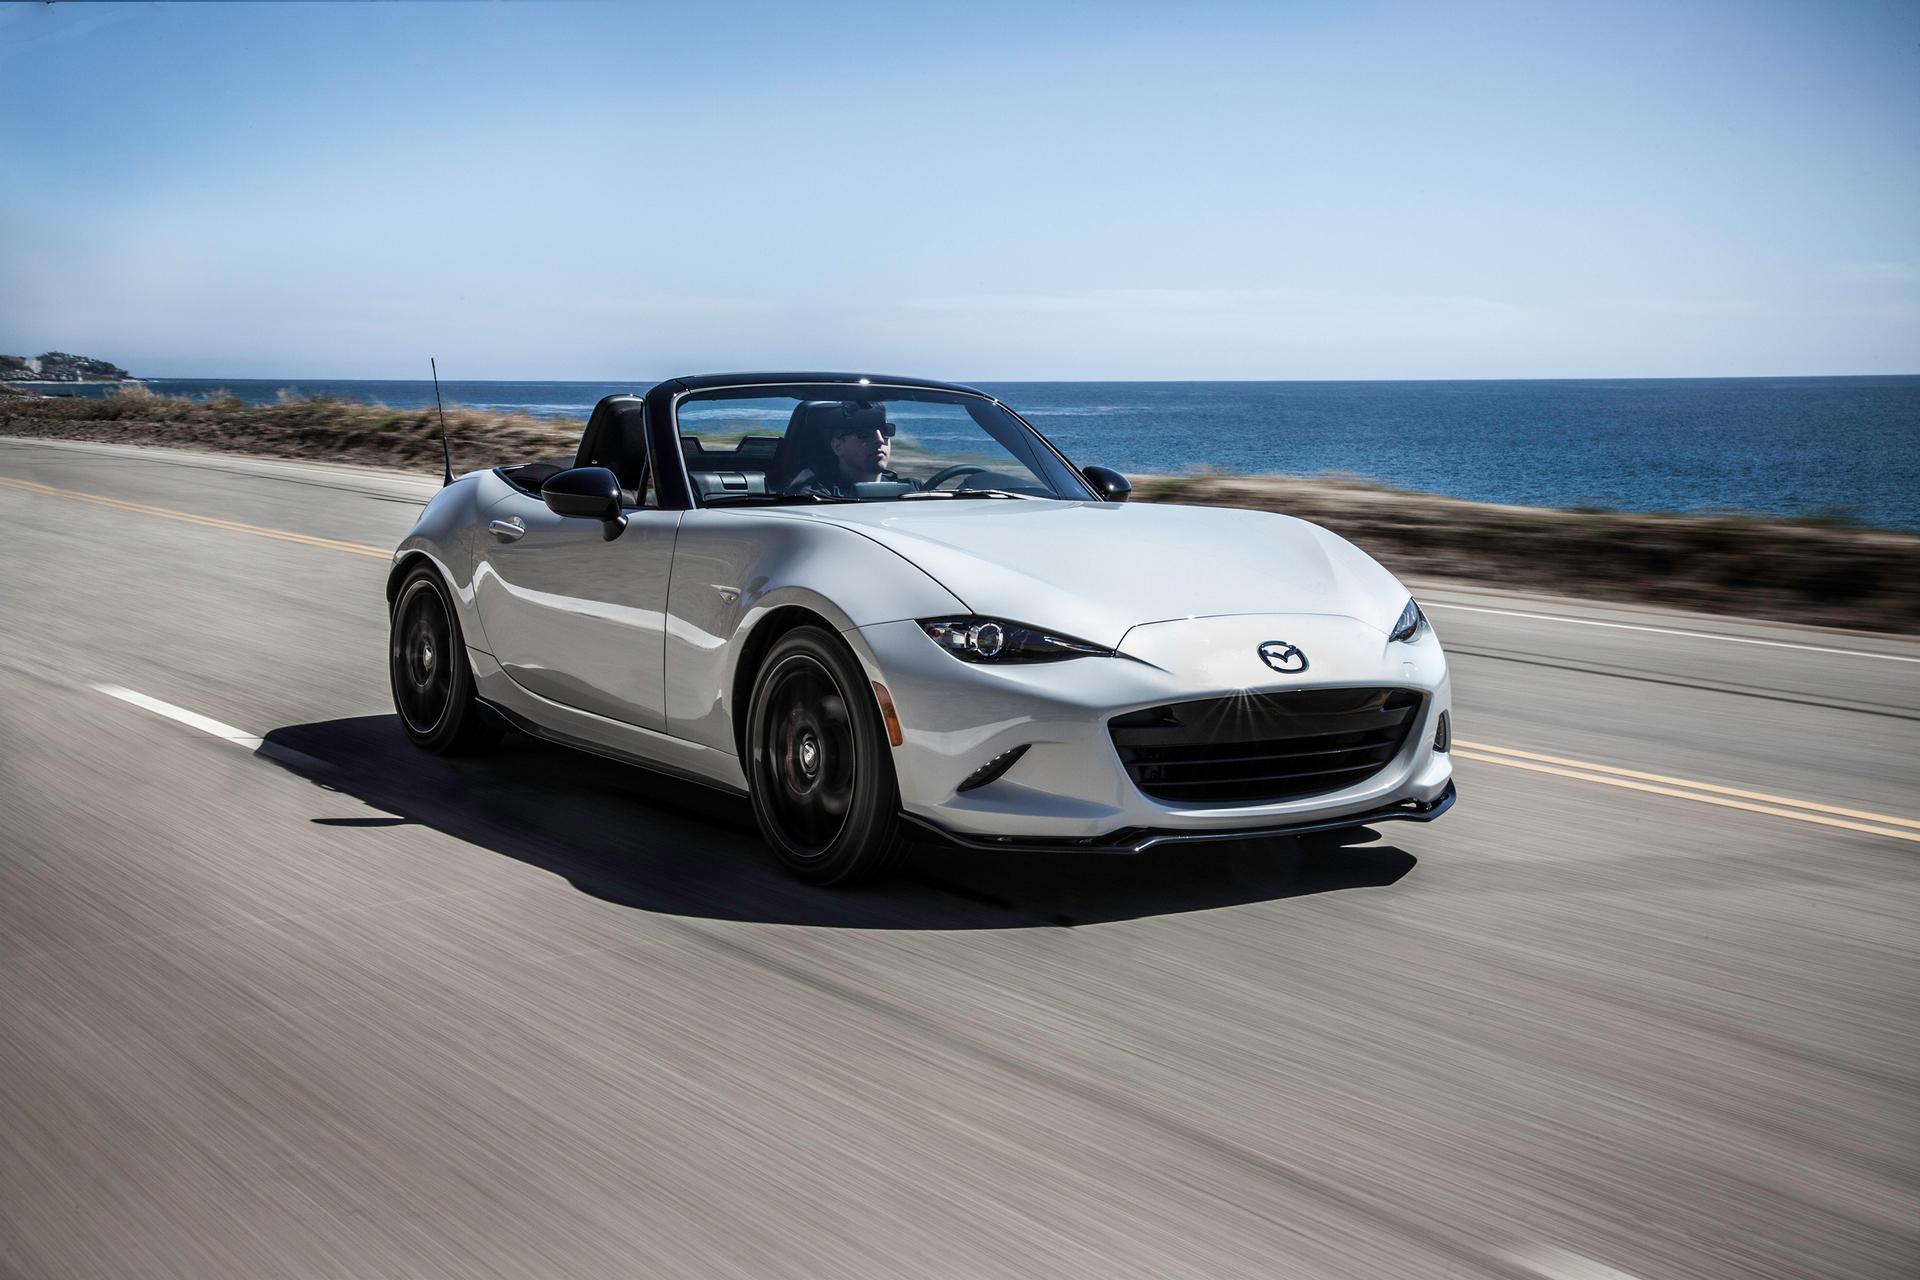 Wonderful Top 10 Sports Cars Under 50k